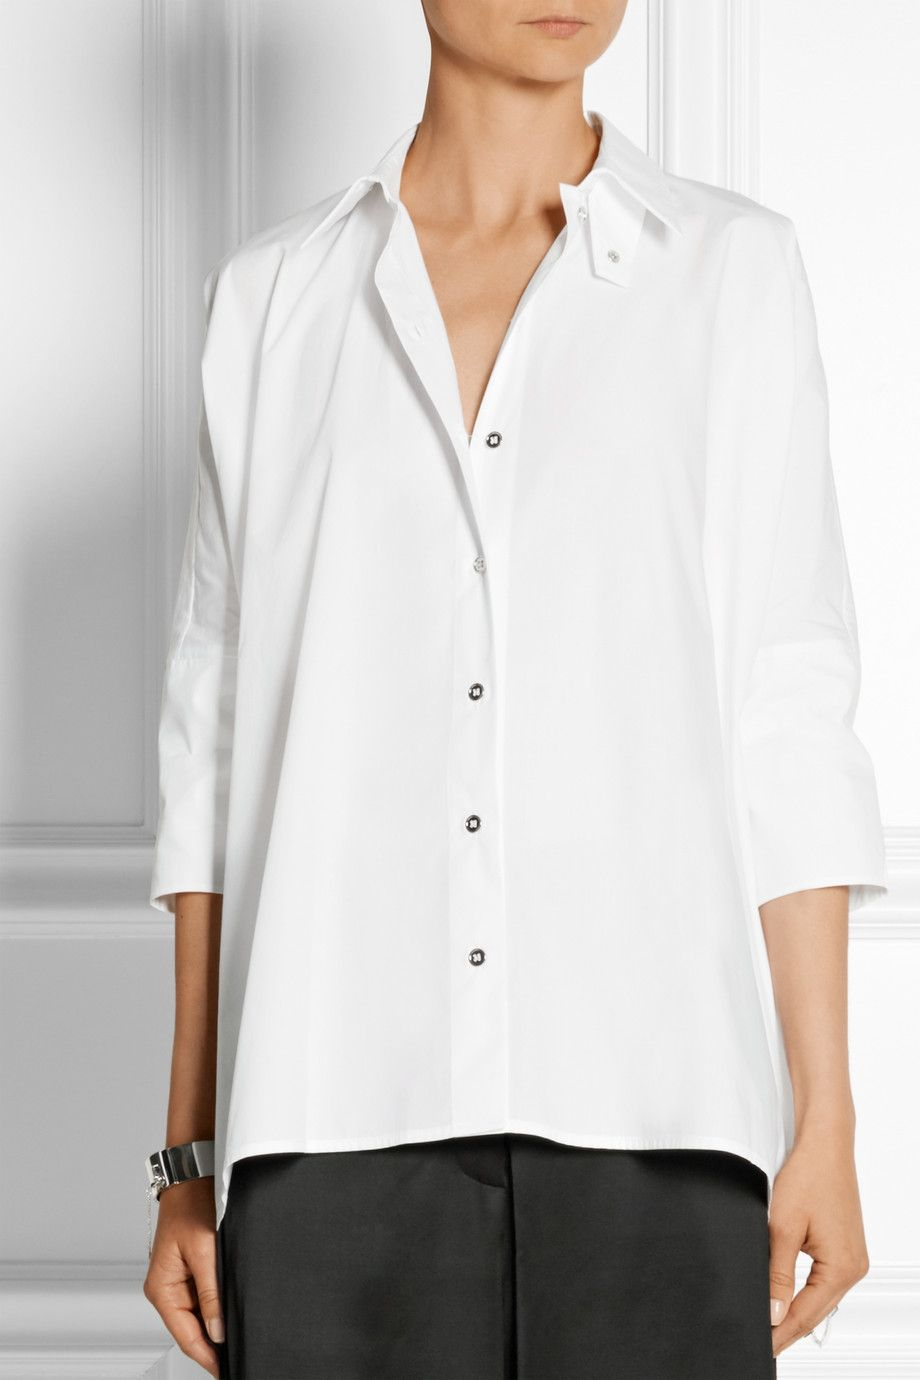 MM6 Maison Margiela|Oversized cotton-poplin shirt|NET-A-PORTER.COM